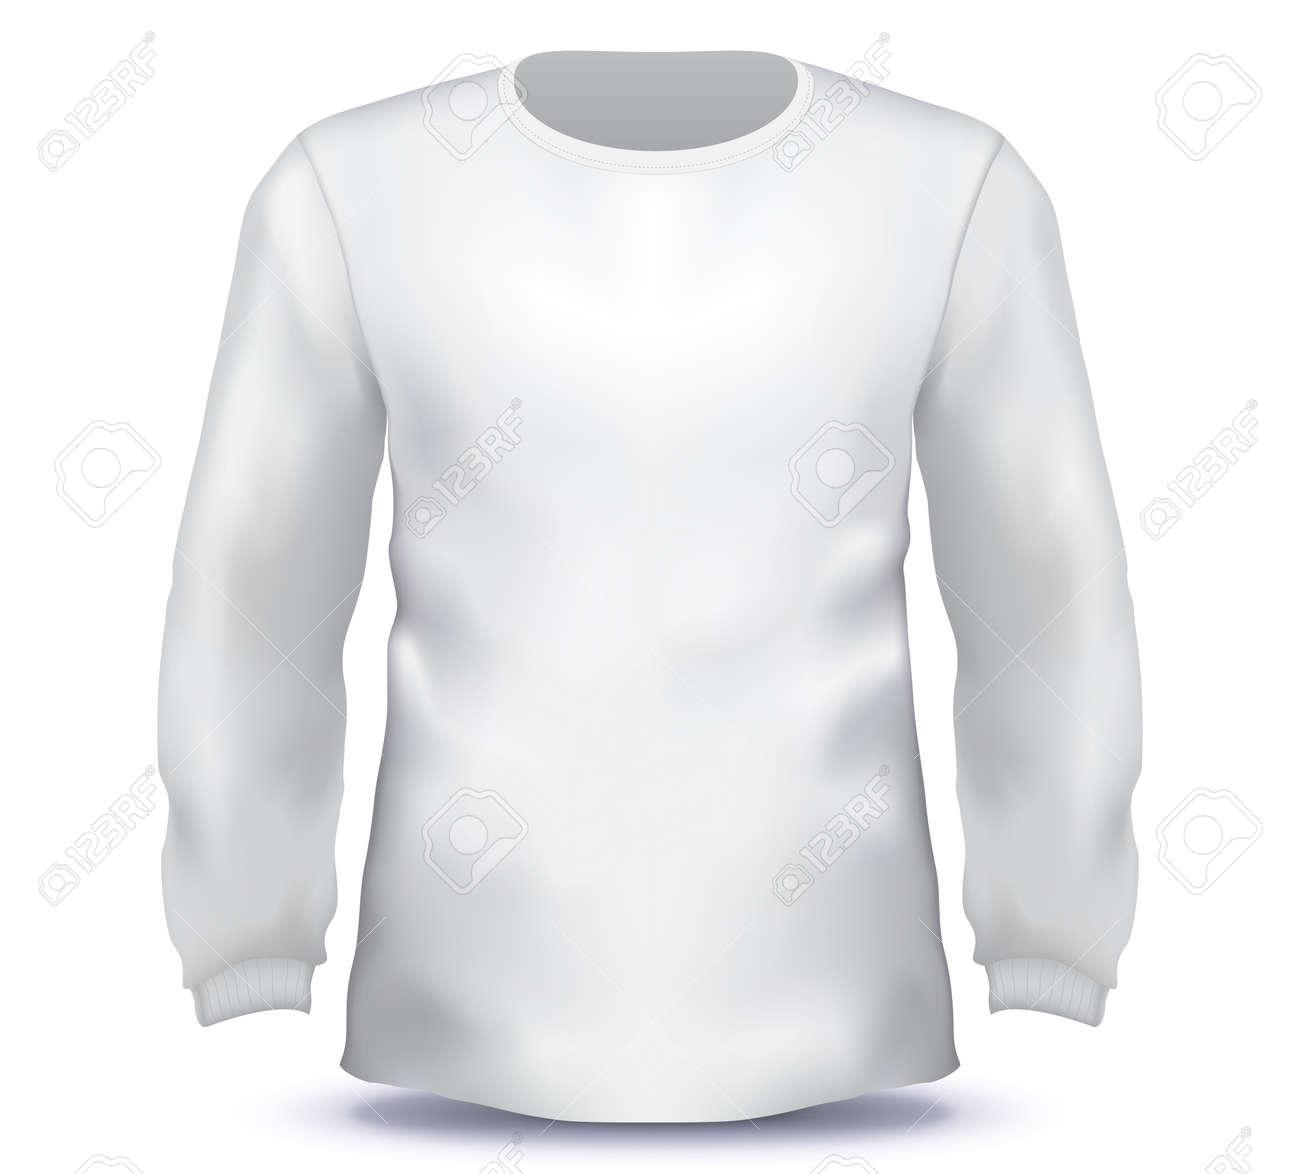 White Male long sleeve shirt vector template. - 159376525